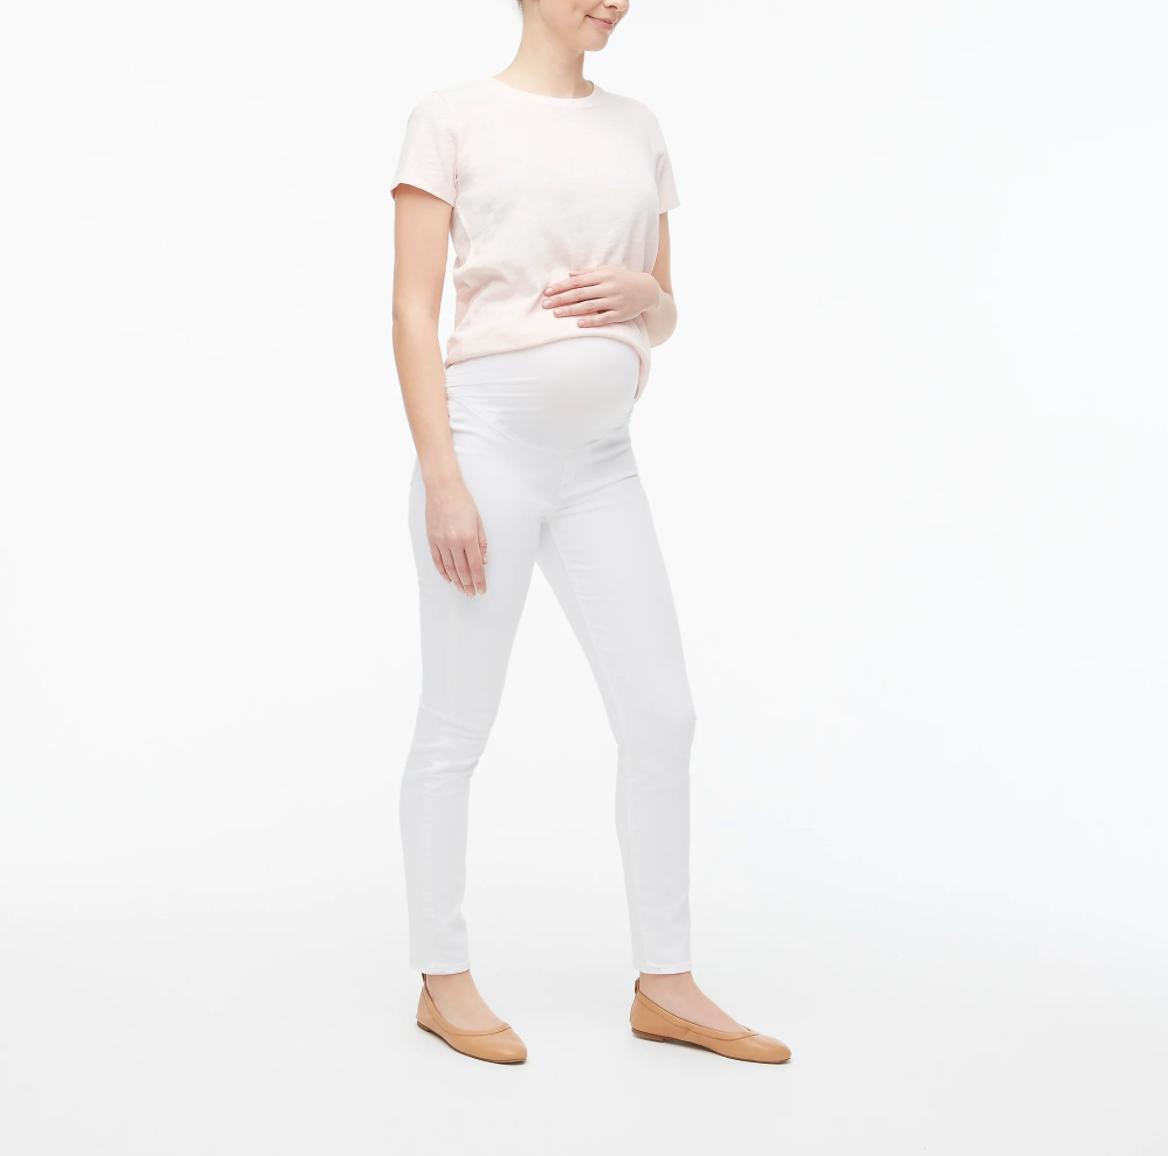 J.Crew White Maternity In White